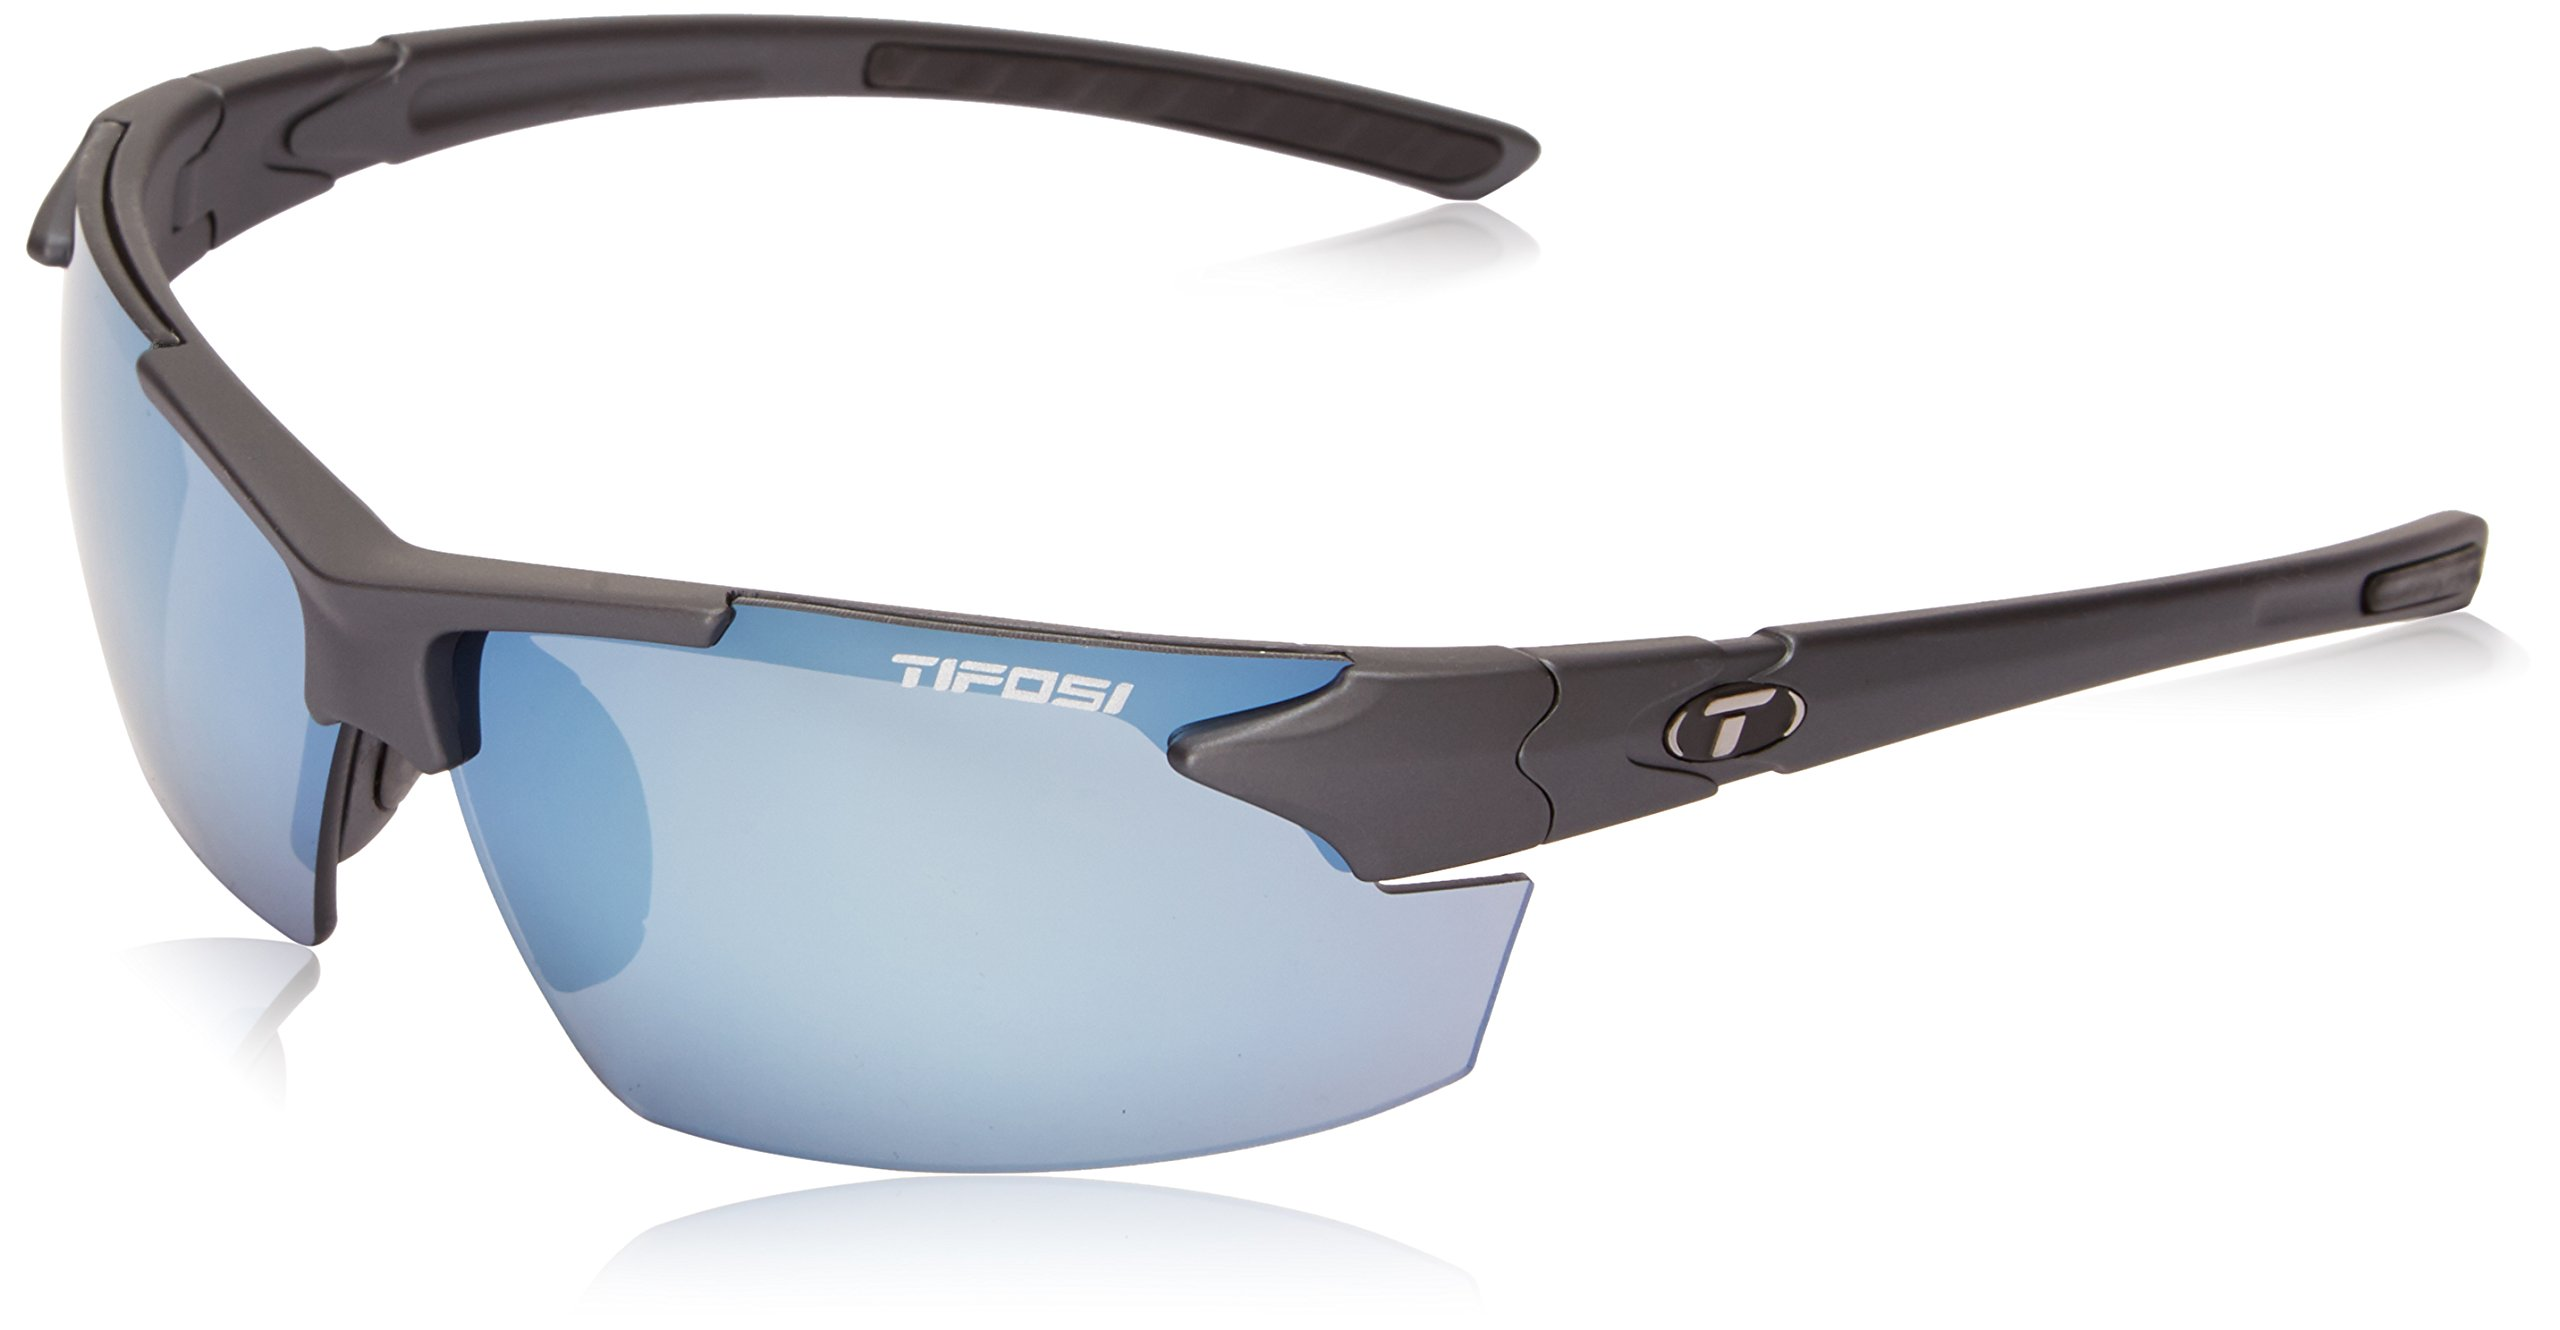 Tifosi Jet FC 1140400381 Wrap Sunglasses, Matte Gunmetal, 70 mm